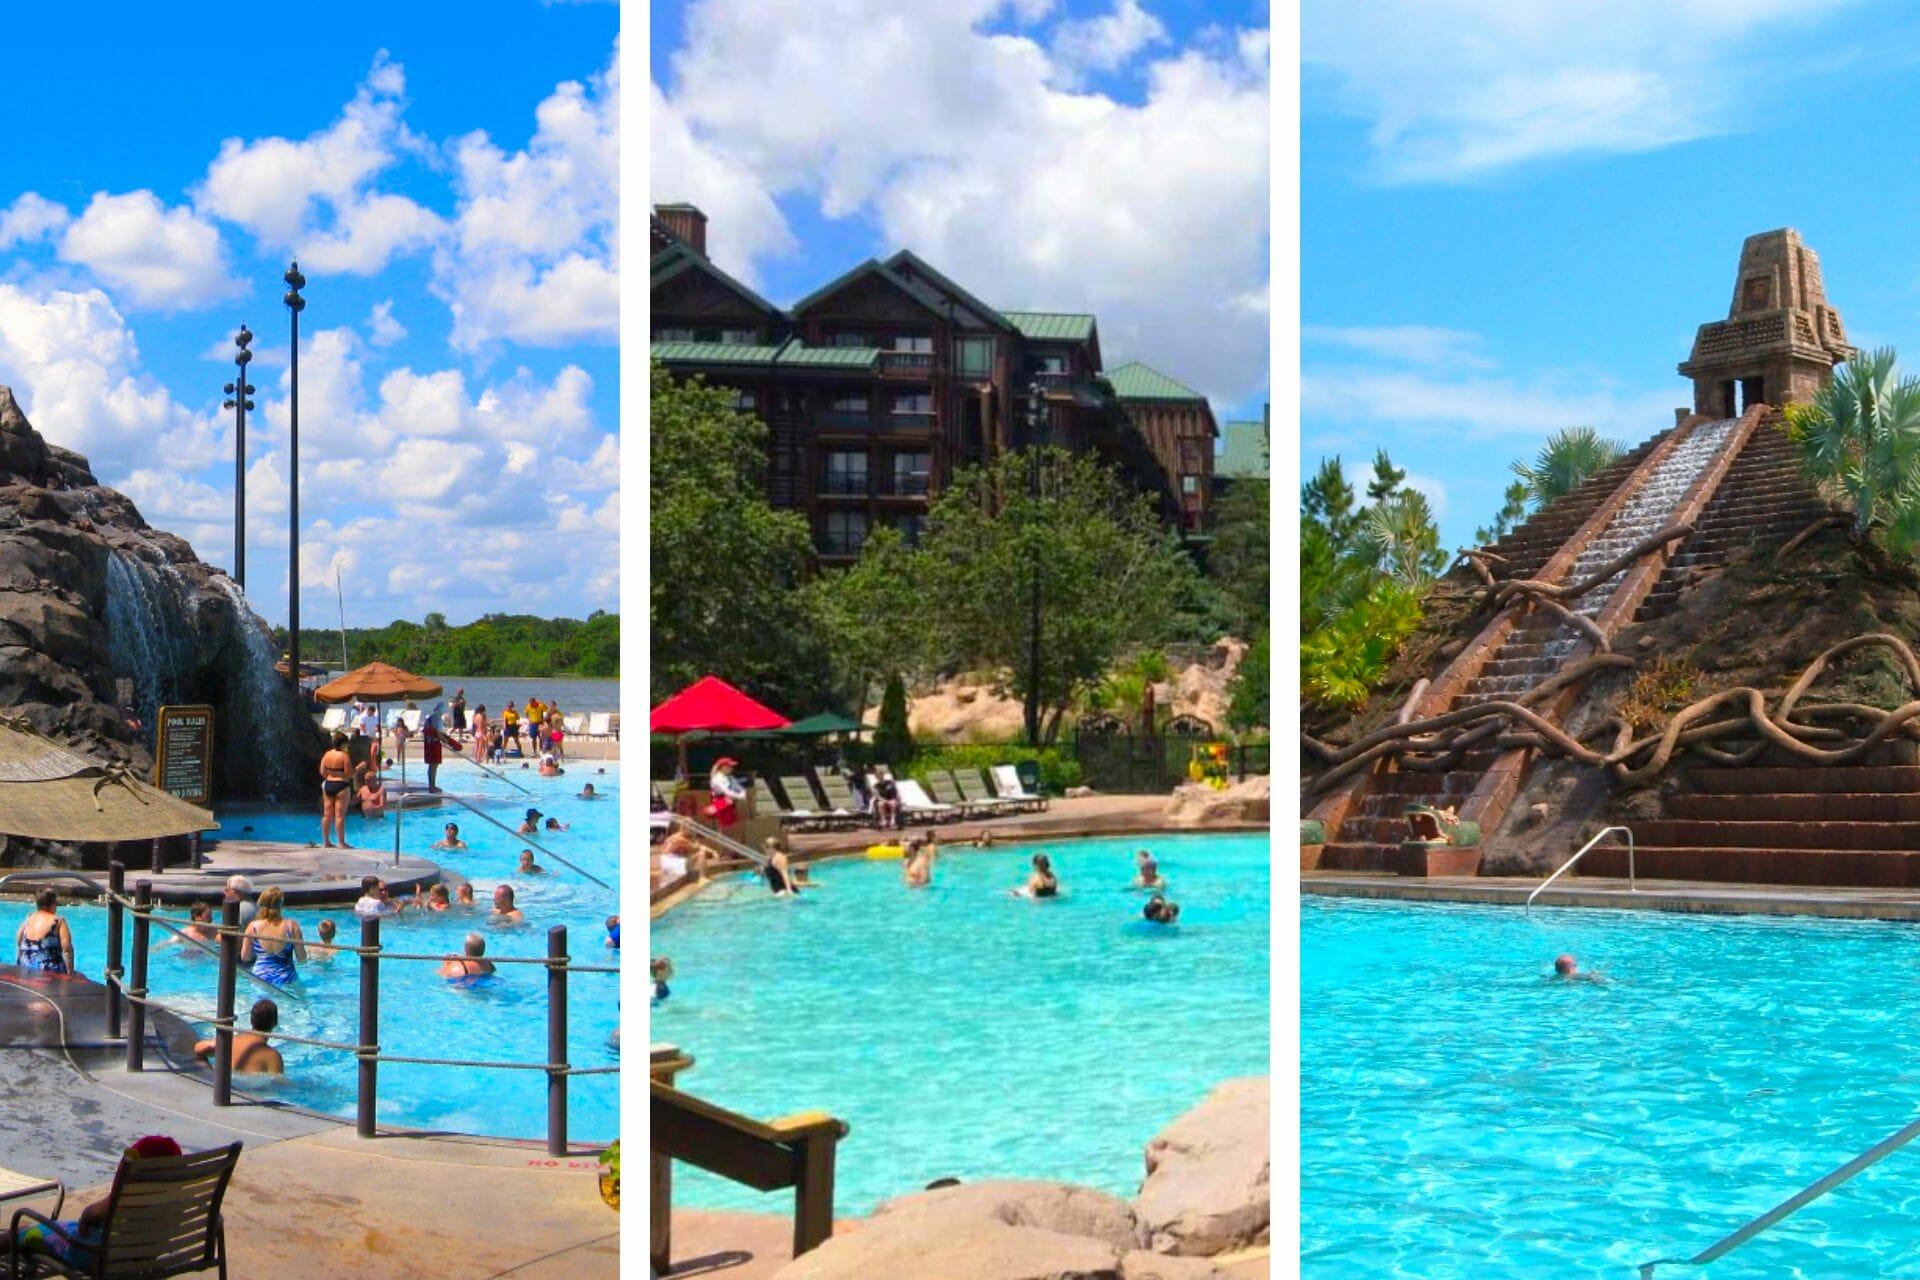 11 Best Pools at Disney World (+ the worst Disney pools!) via @allamericanatlas